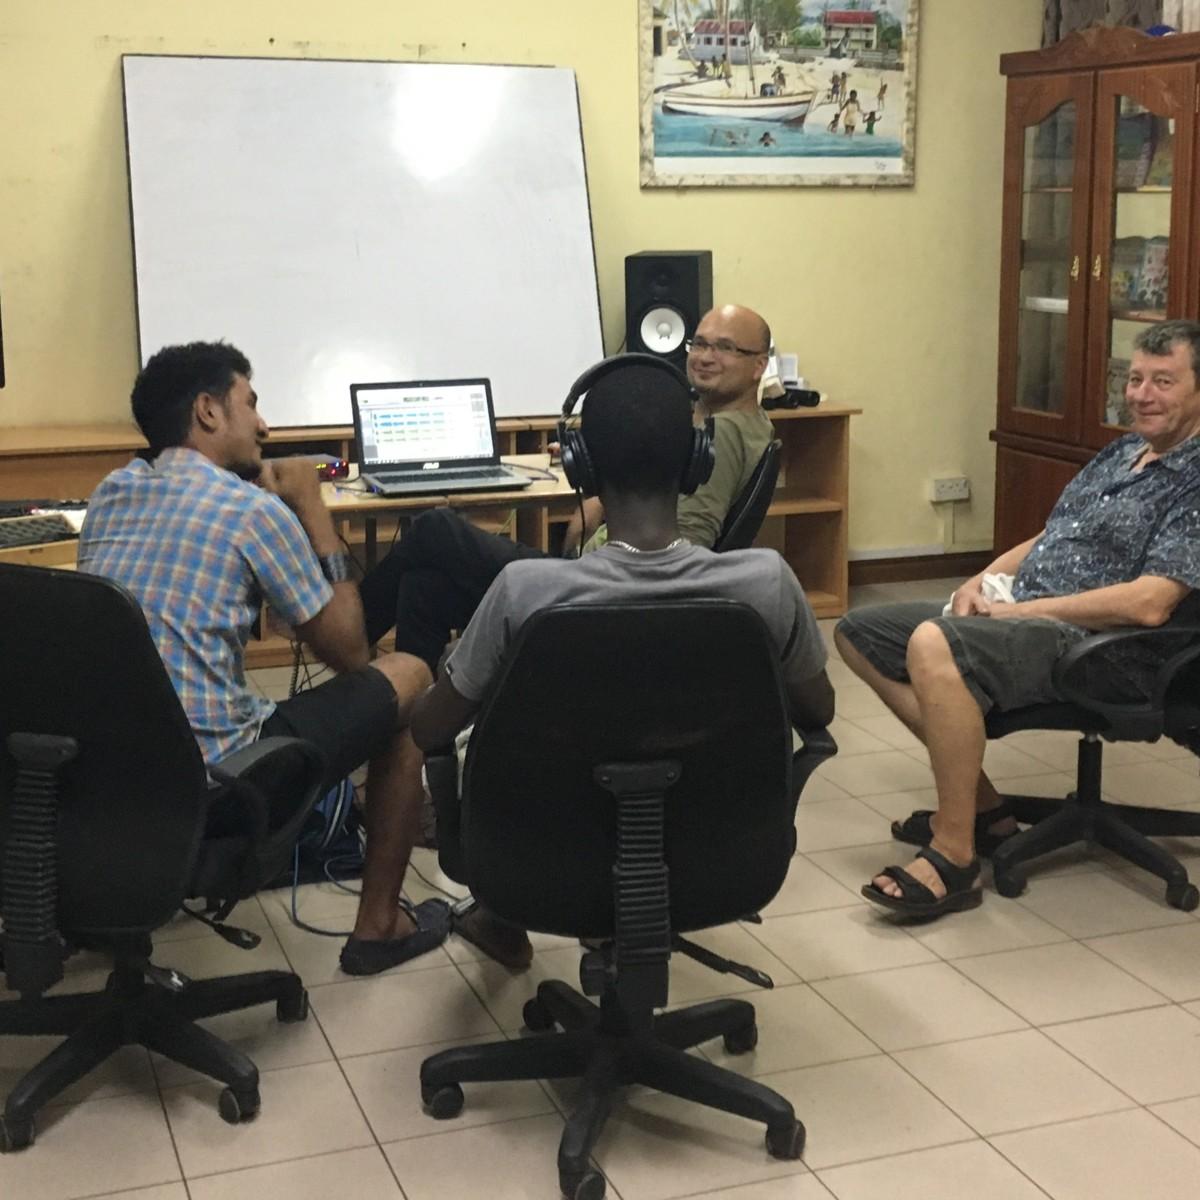 Philippe de Magnée, Denis Essoo and Live Top Crew Team recording Leritaz Kiltir Chagossien